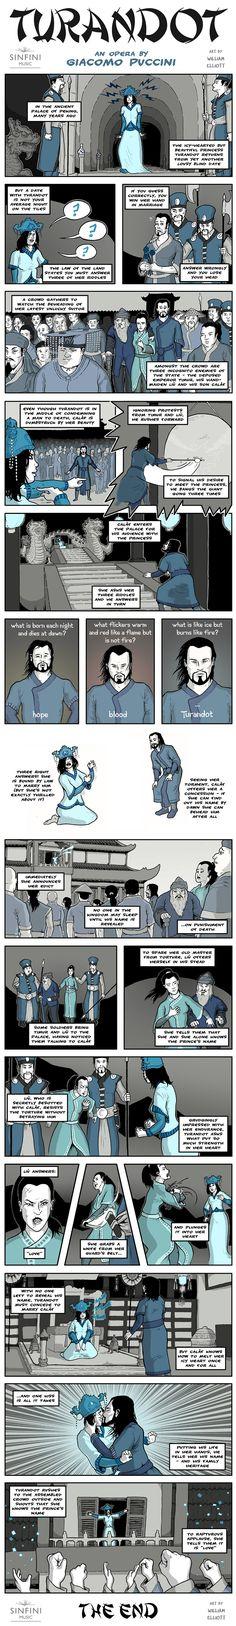 Turandot: An Opera by Giacomo Puccini. Opera Comic Strip Art by William Elliott #operaexplained